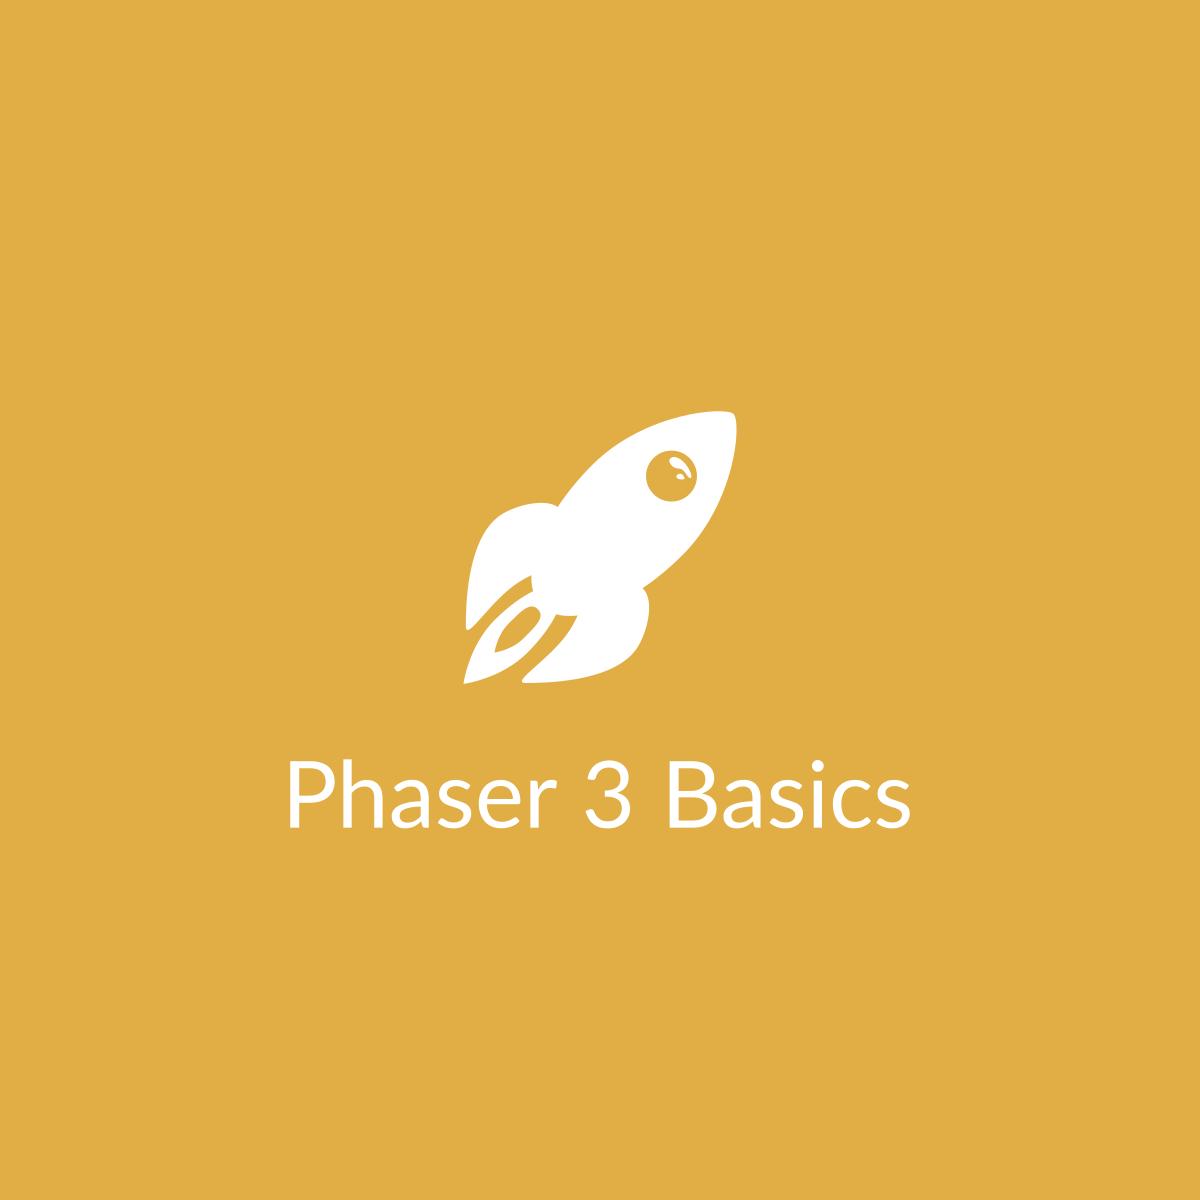 Phaser 3 Basics: An Introduction